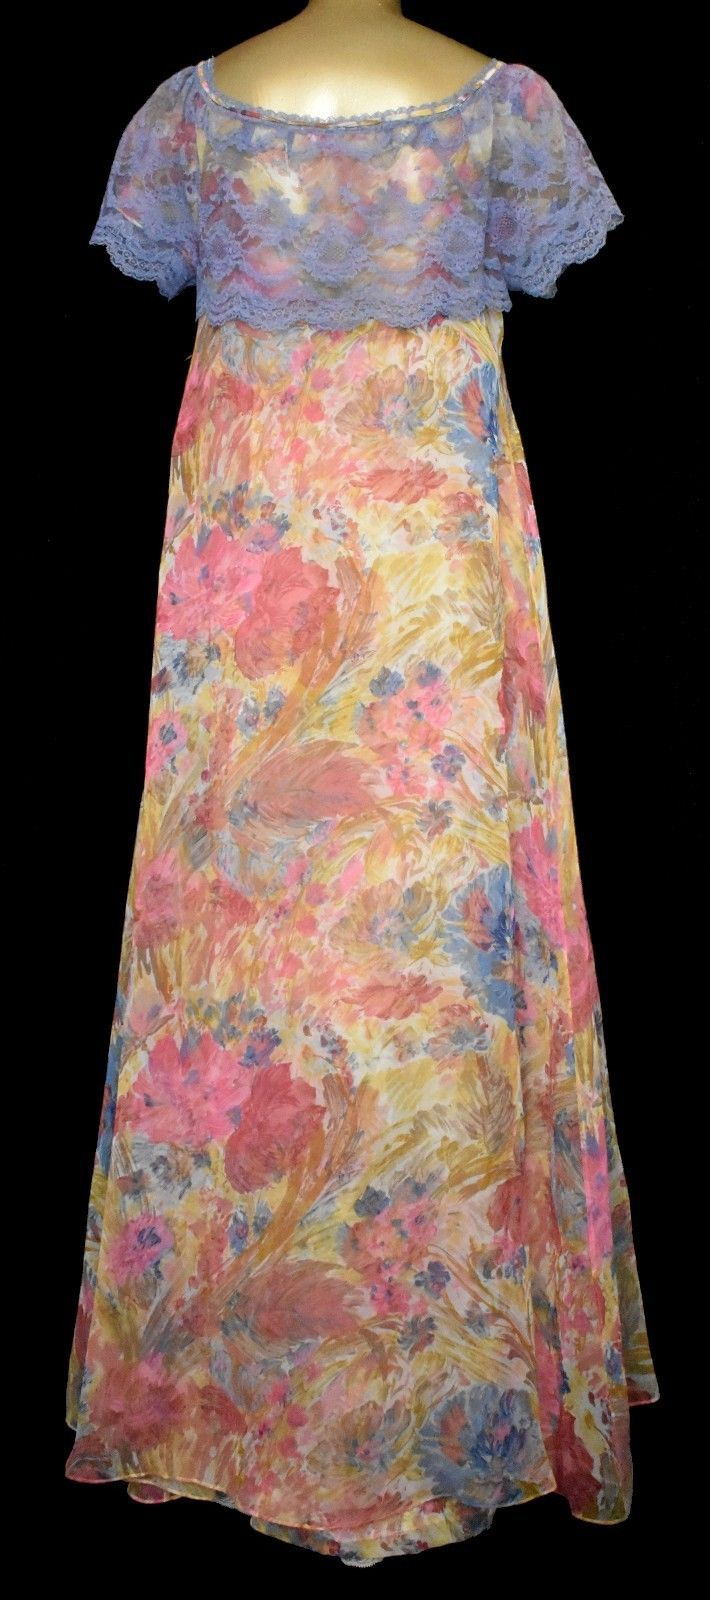 Odette Barsa Peignoir Set Nightgown and Robe Vintage 50s Floral Print  Chiffon S 883e4dc84